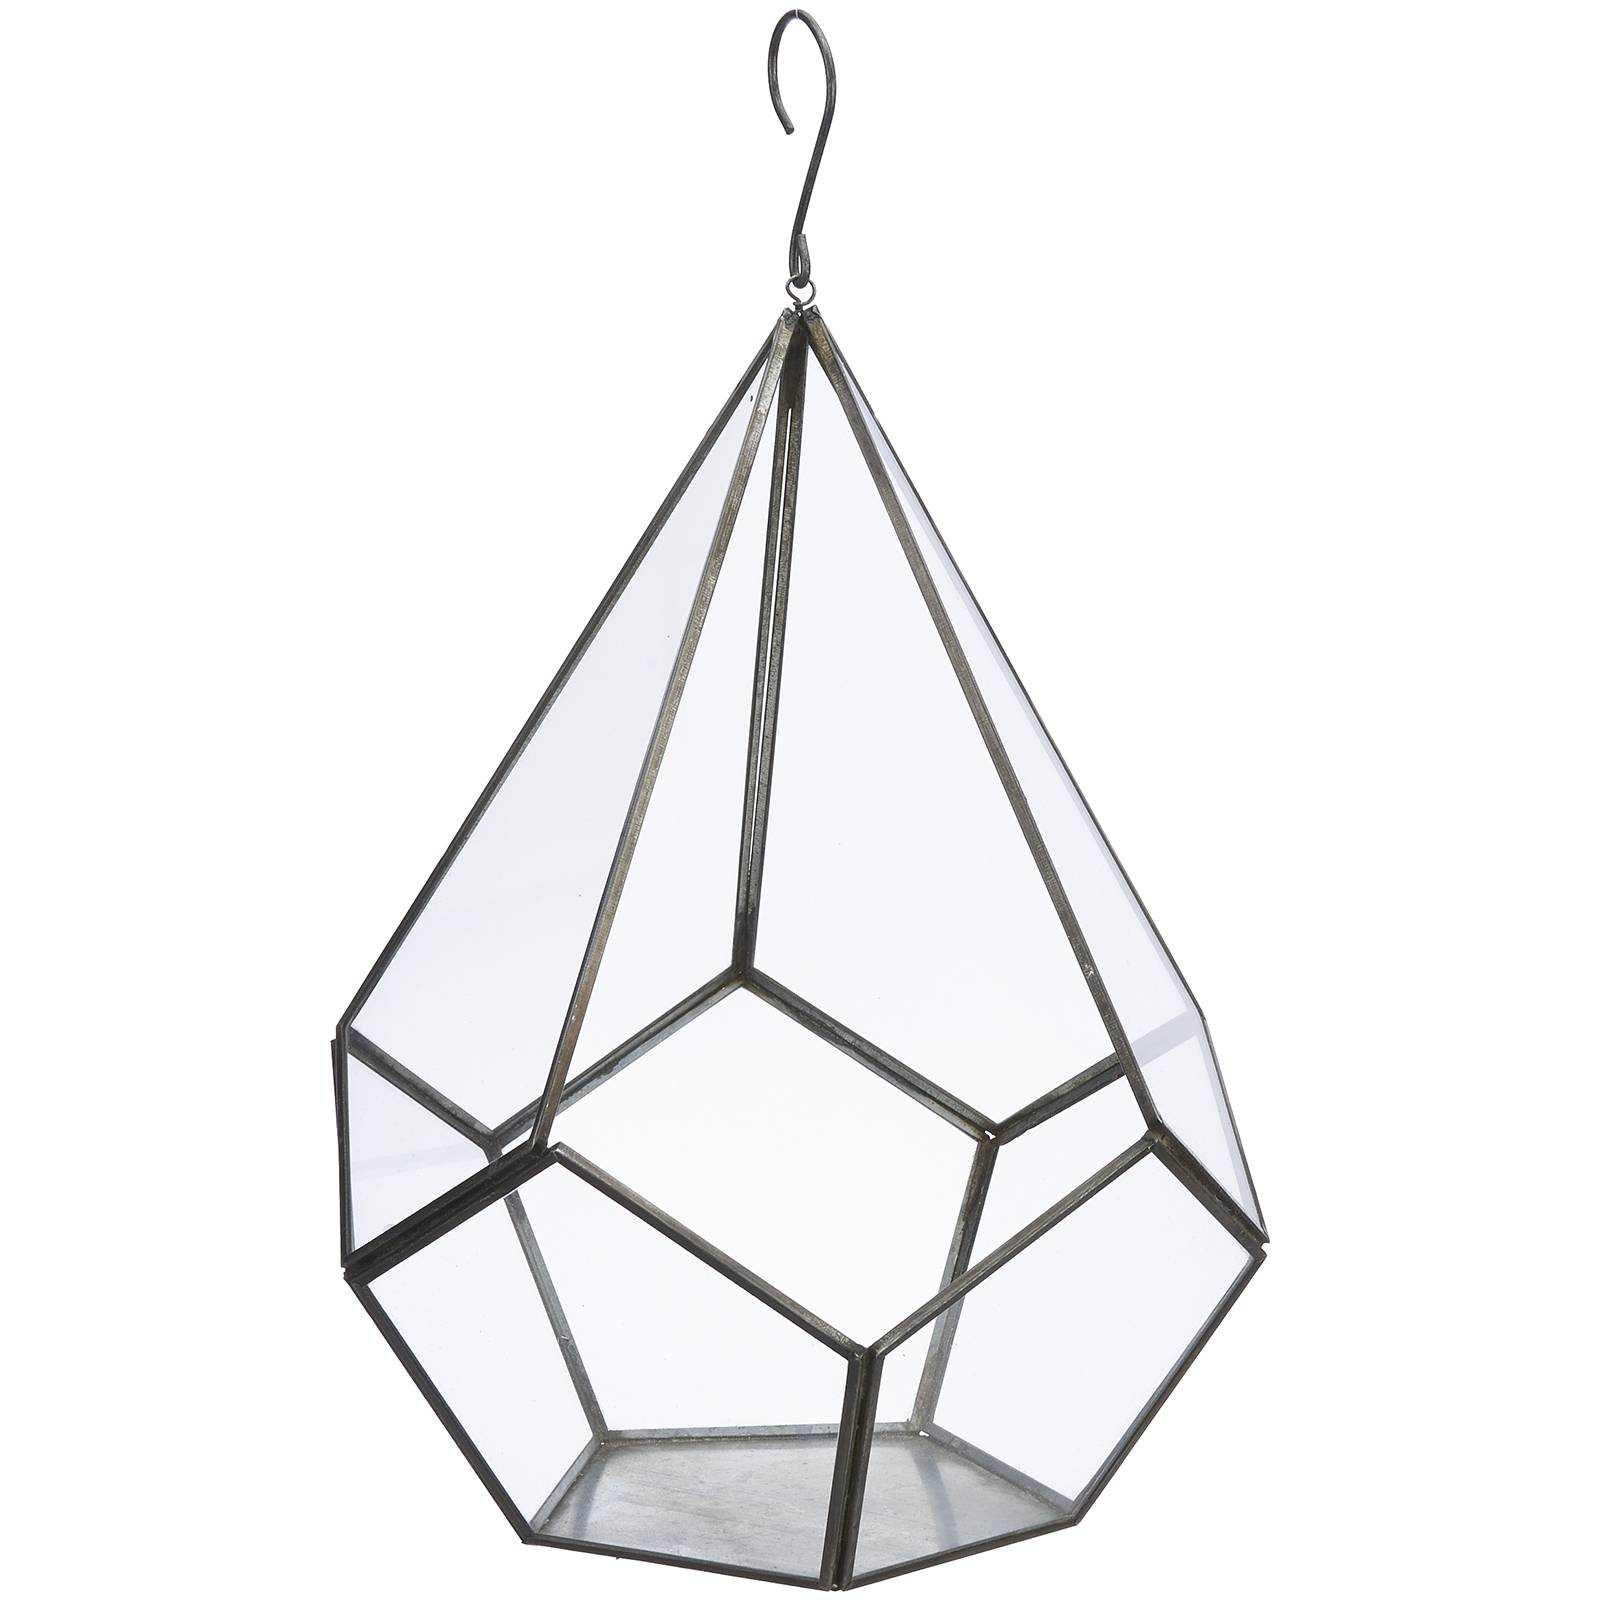 Nkuku Manduri Hanging Planter - Antique Zinc - Small